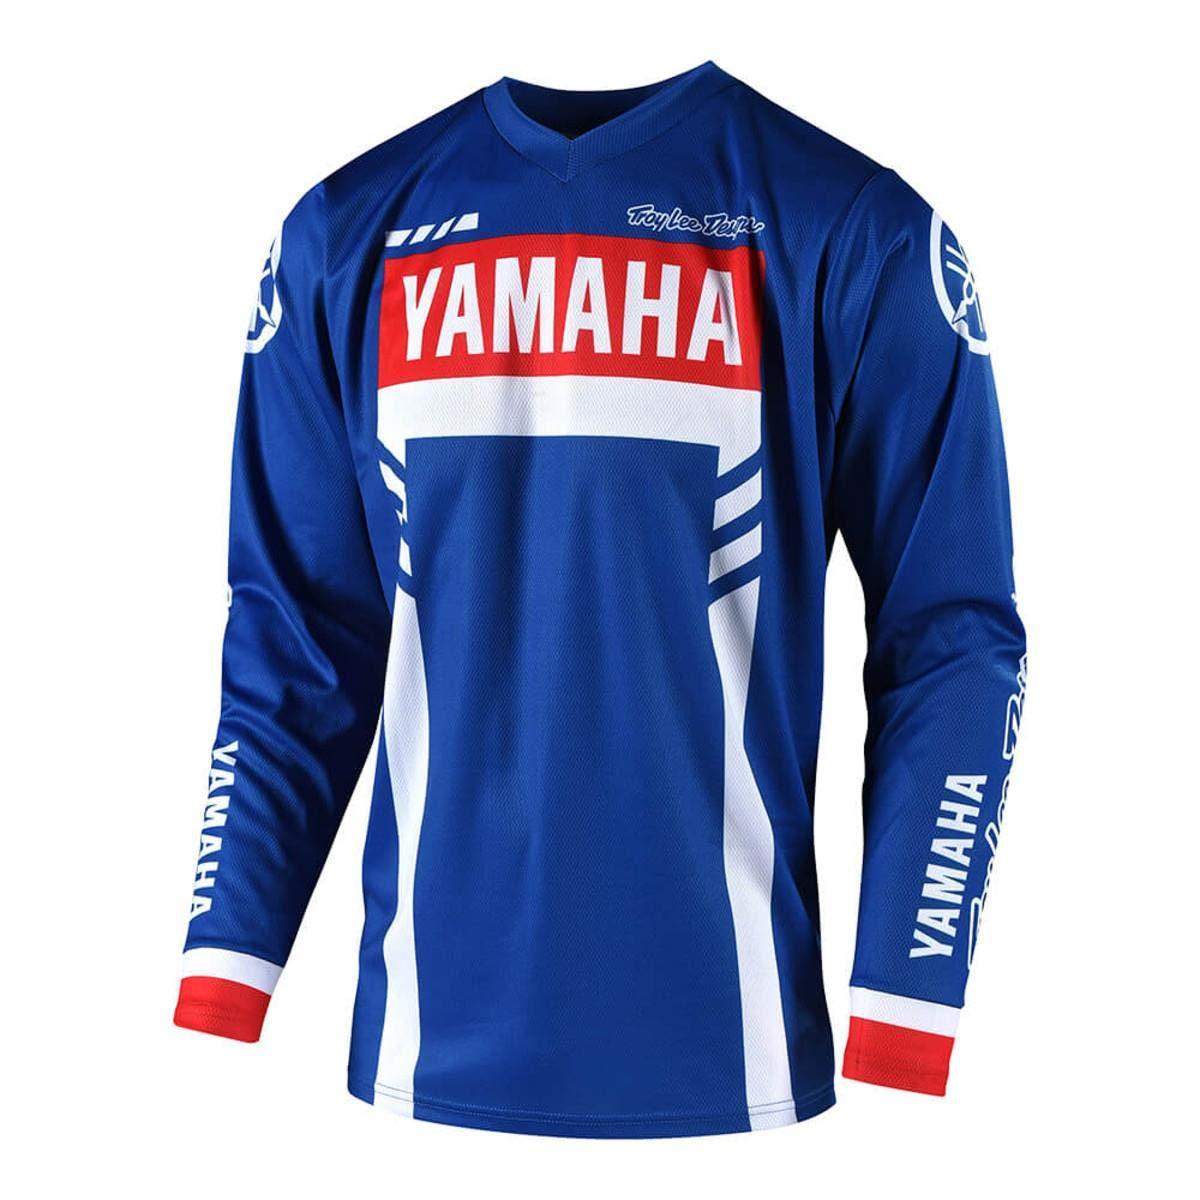 Troy Lee Designs 2018 GP Yamaha RS1 Jersey-XL